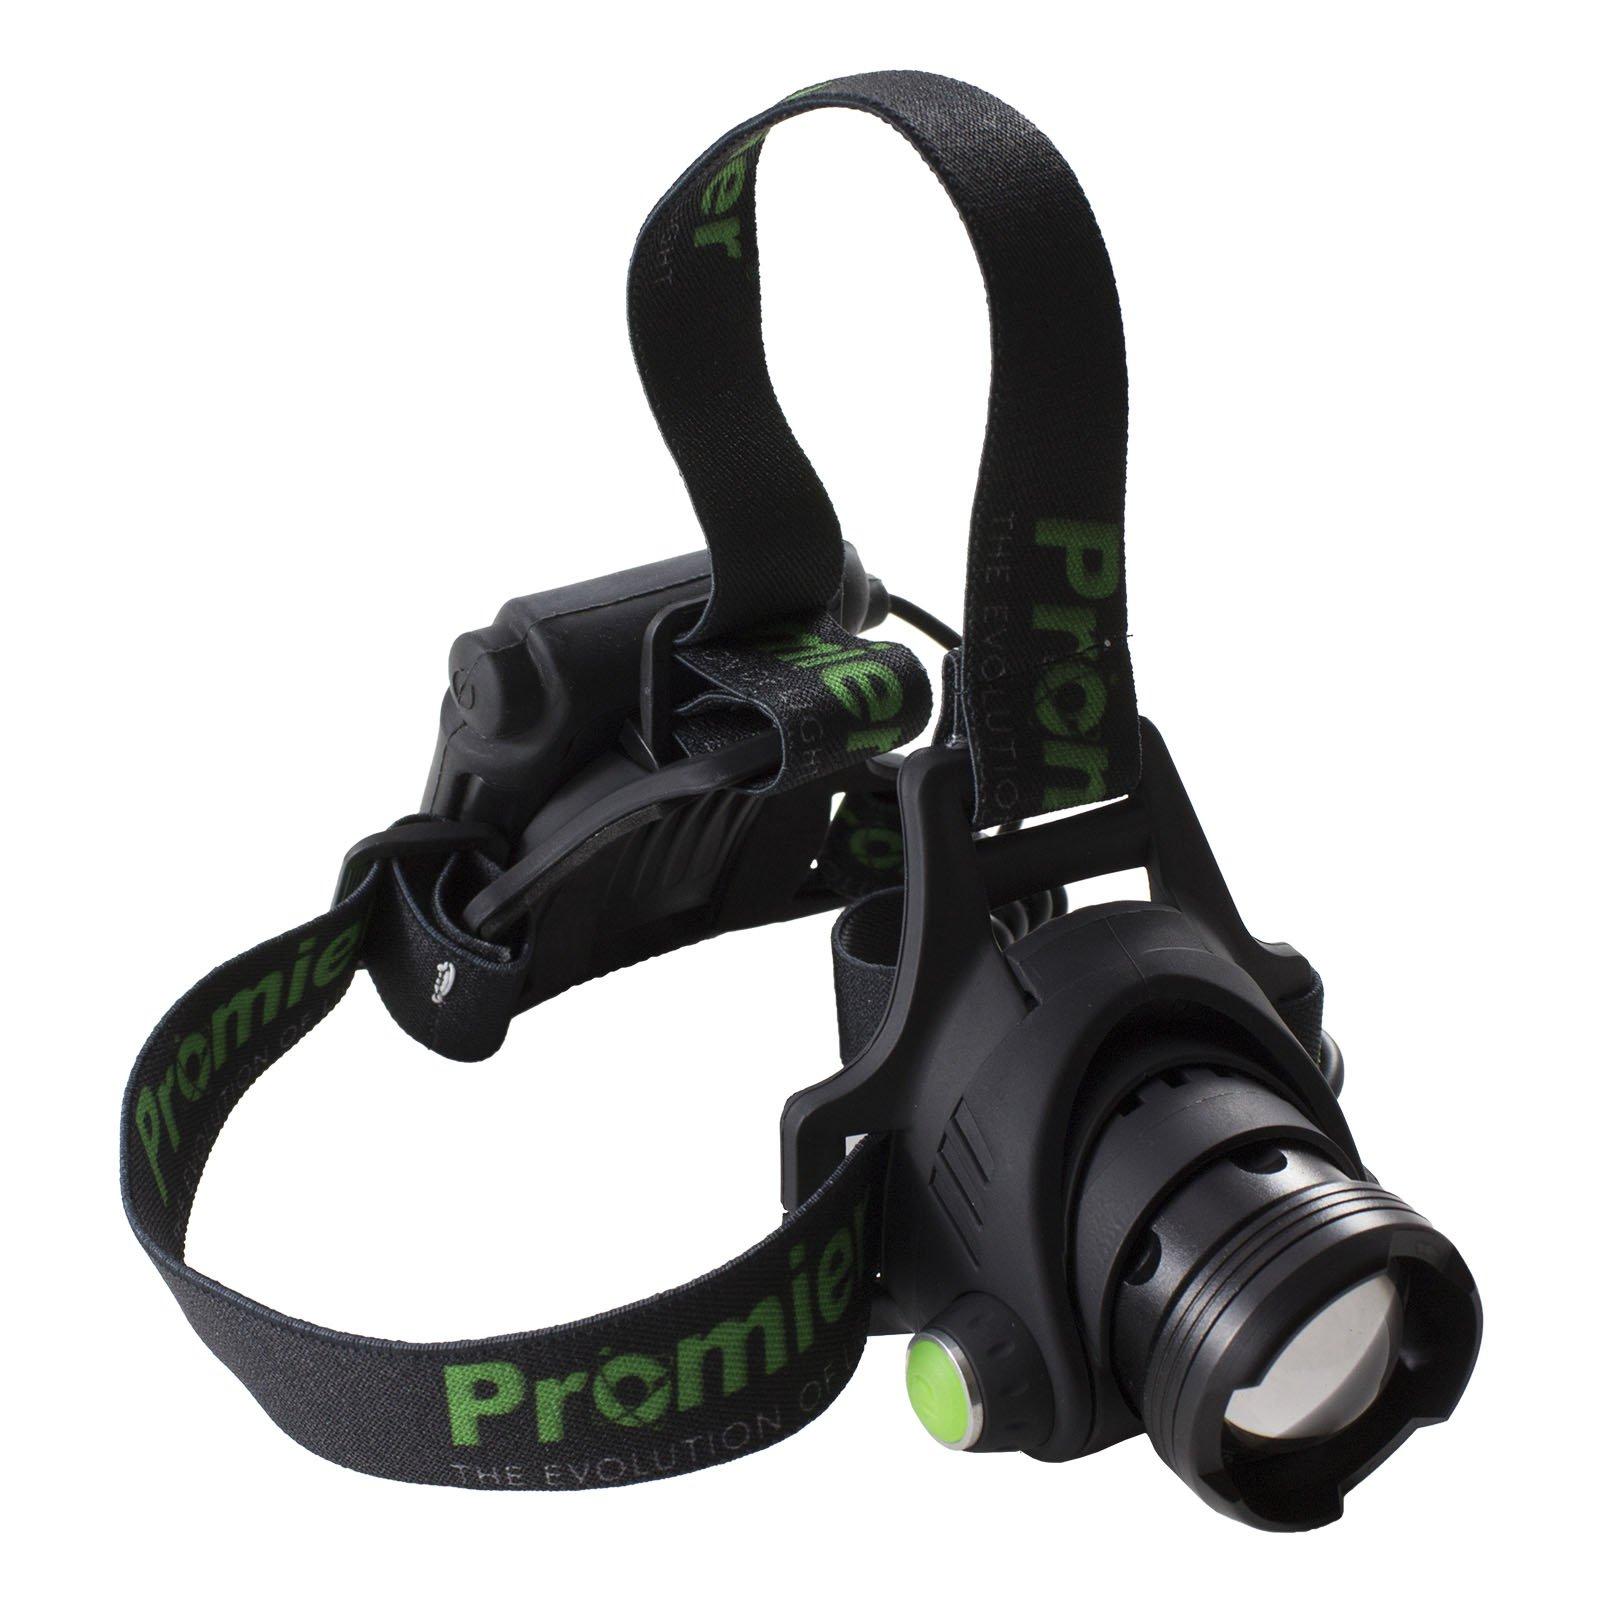 800 Lumen Headlamp Work Light (100% Mfg Guarantee) Adjustable Straps Fits Easily on your Head or Hard Hats, Bike Helmets and Over Caps